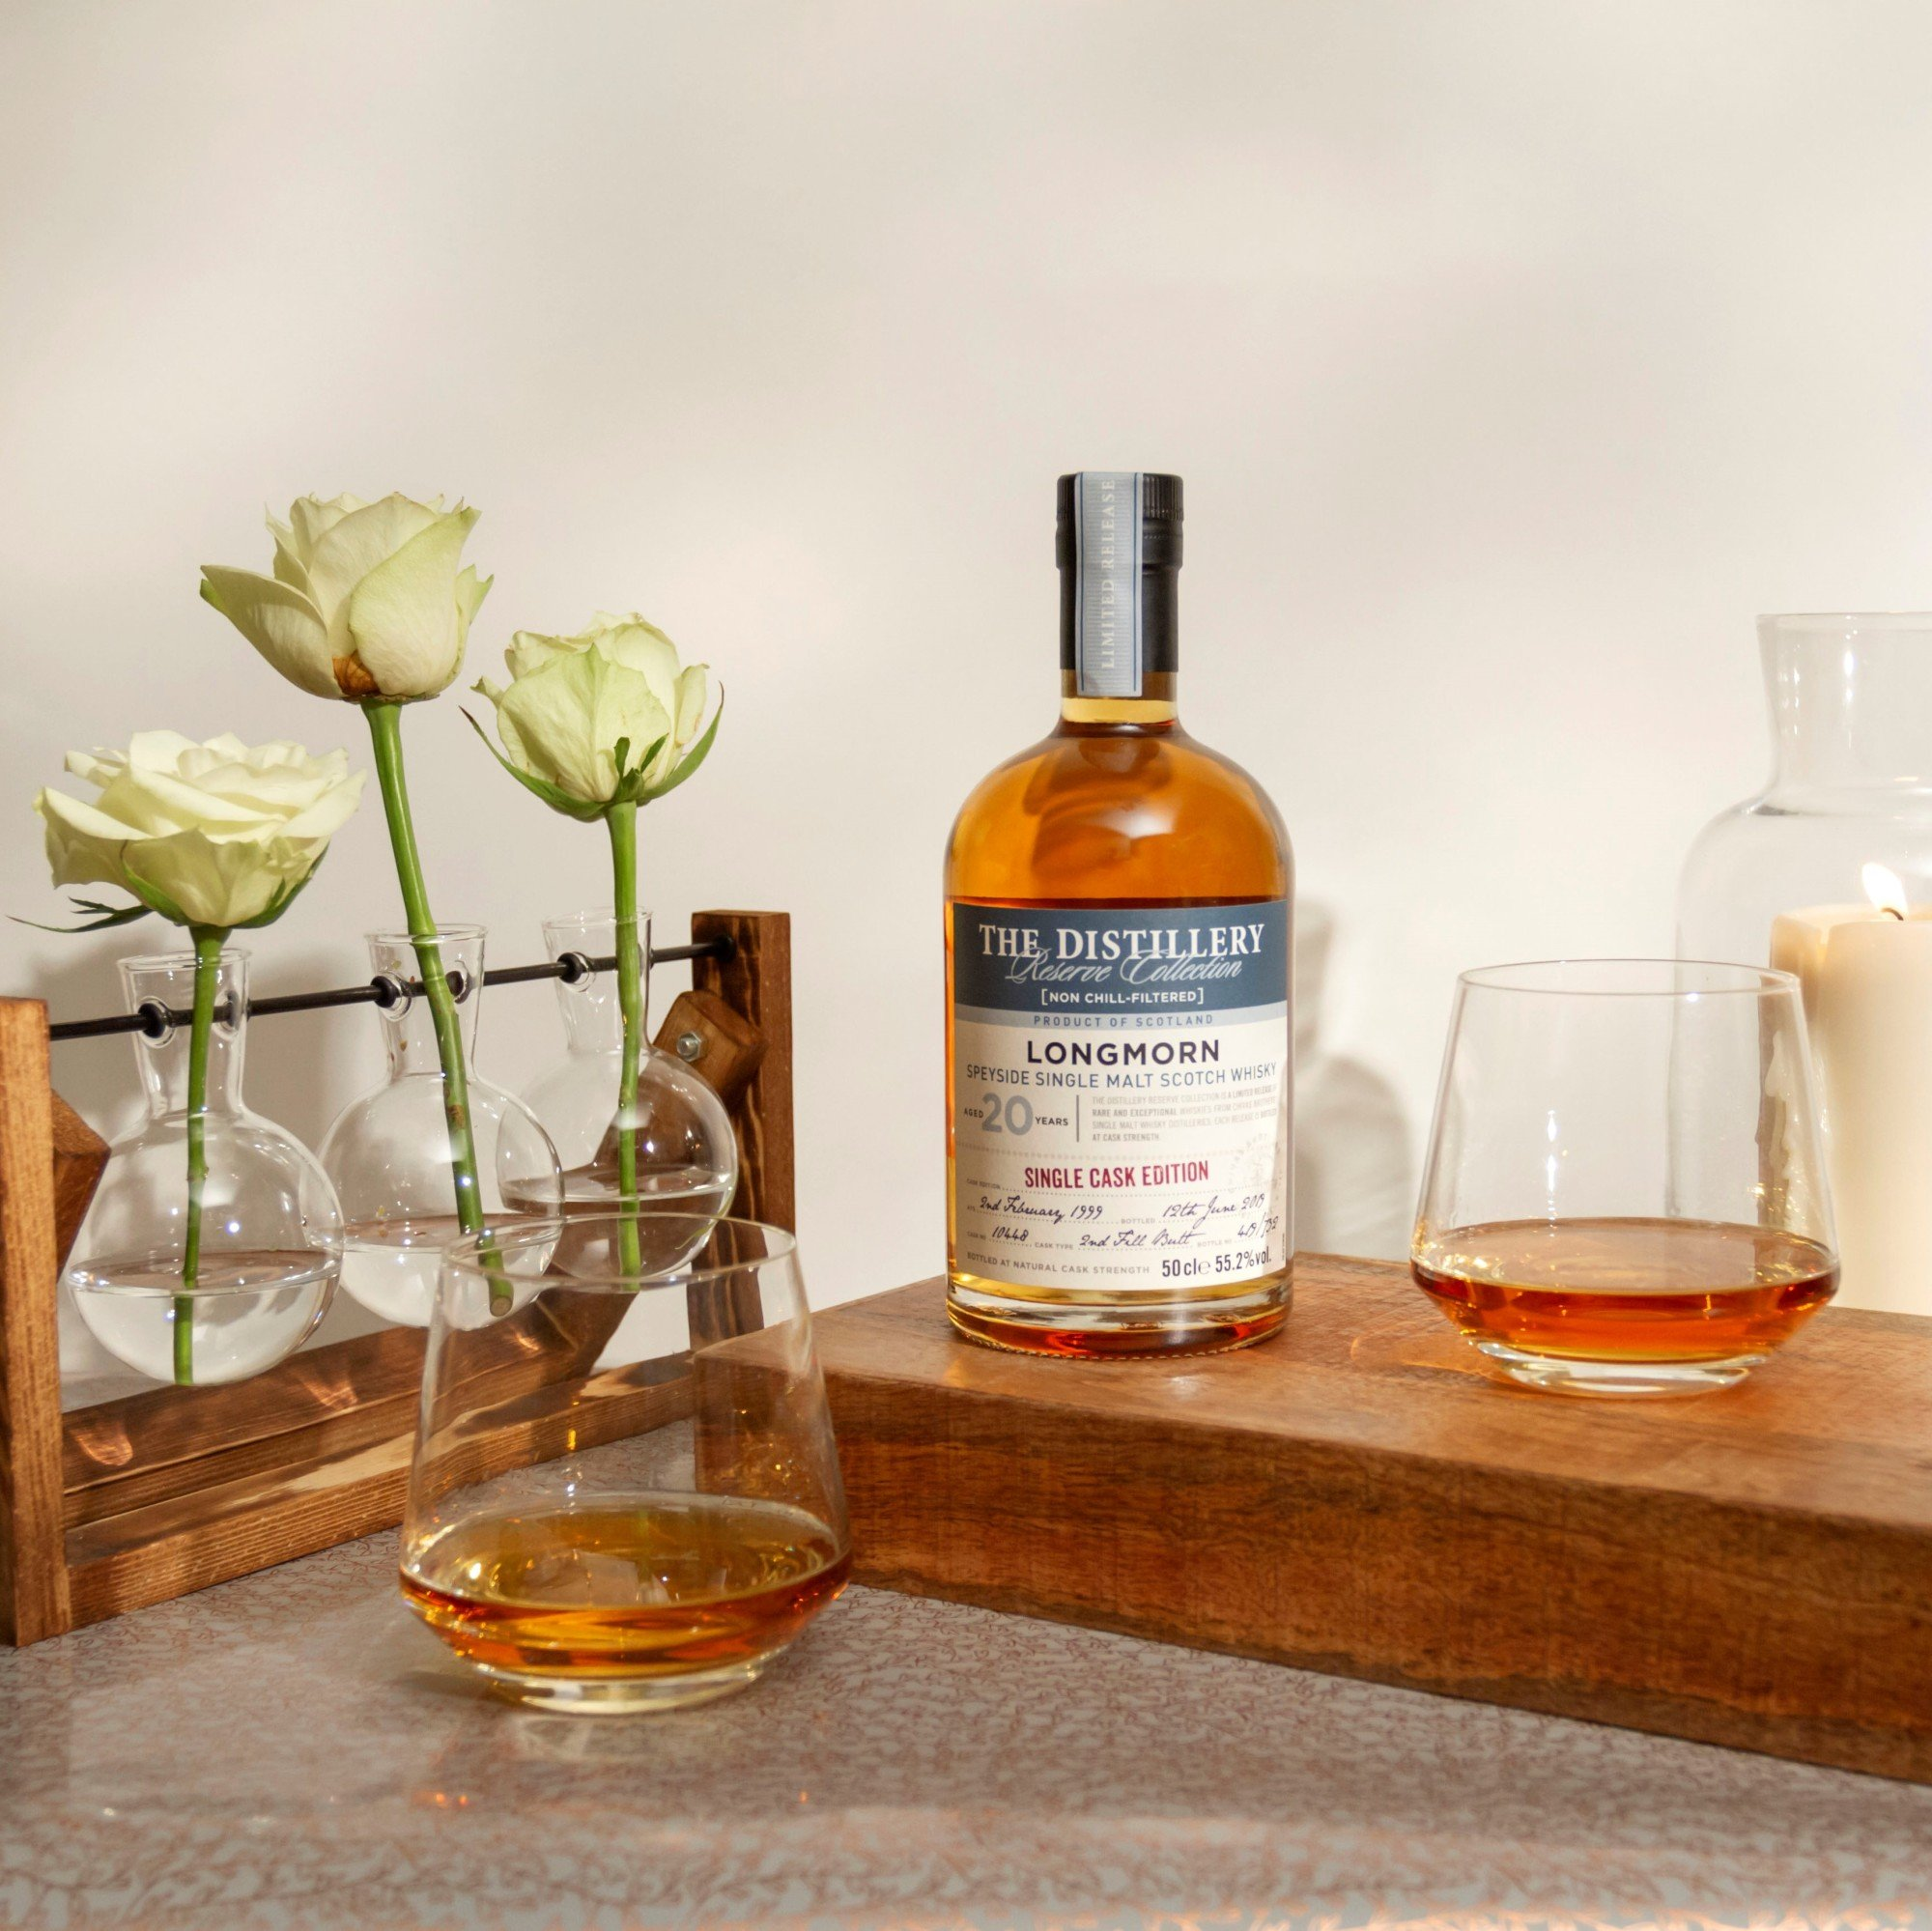 Longmorn 20 Year Old Single Malt Whisky